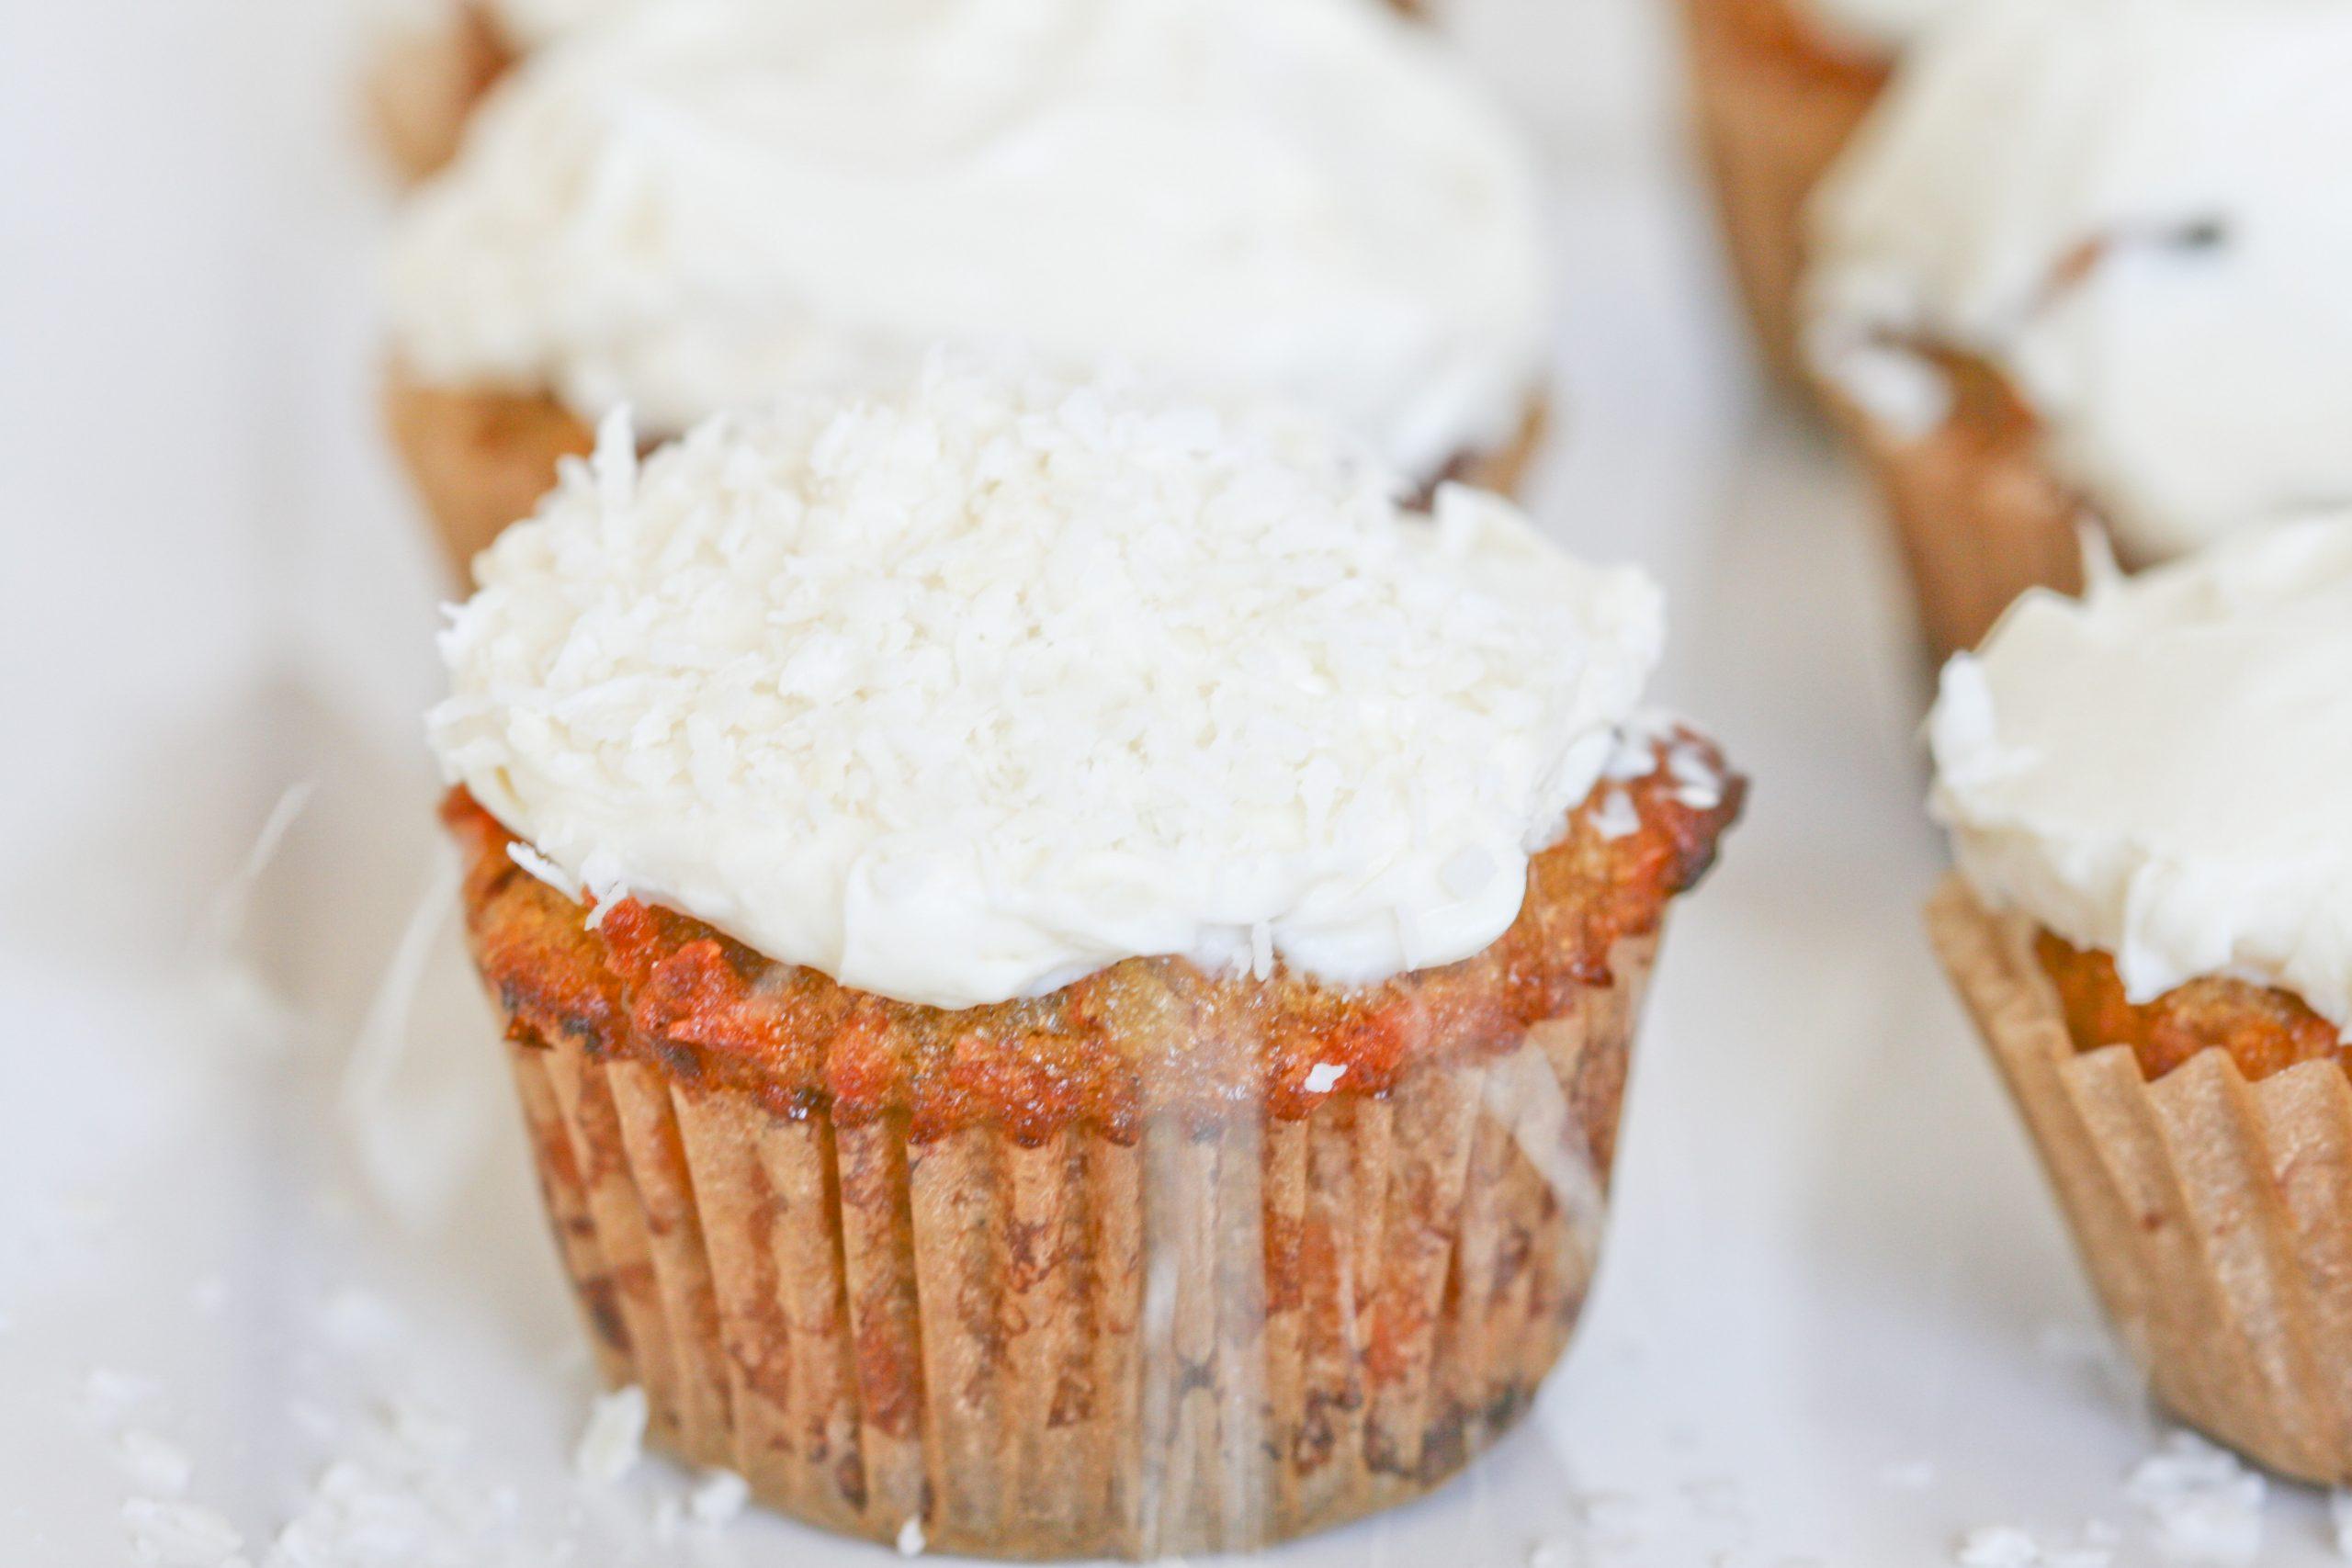 Grain Free Carrot Cupcakes With Honey Cream Cheese